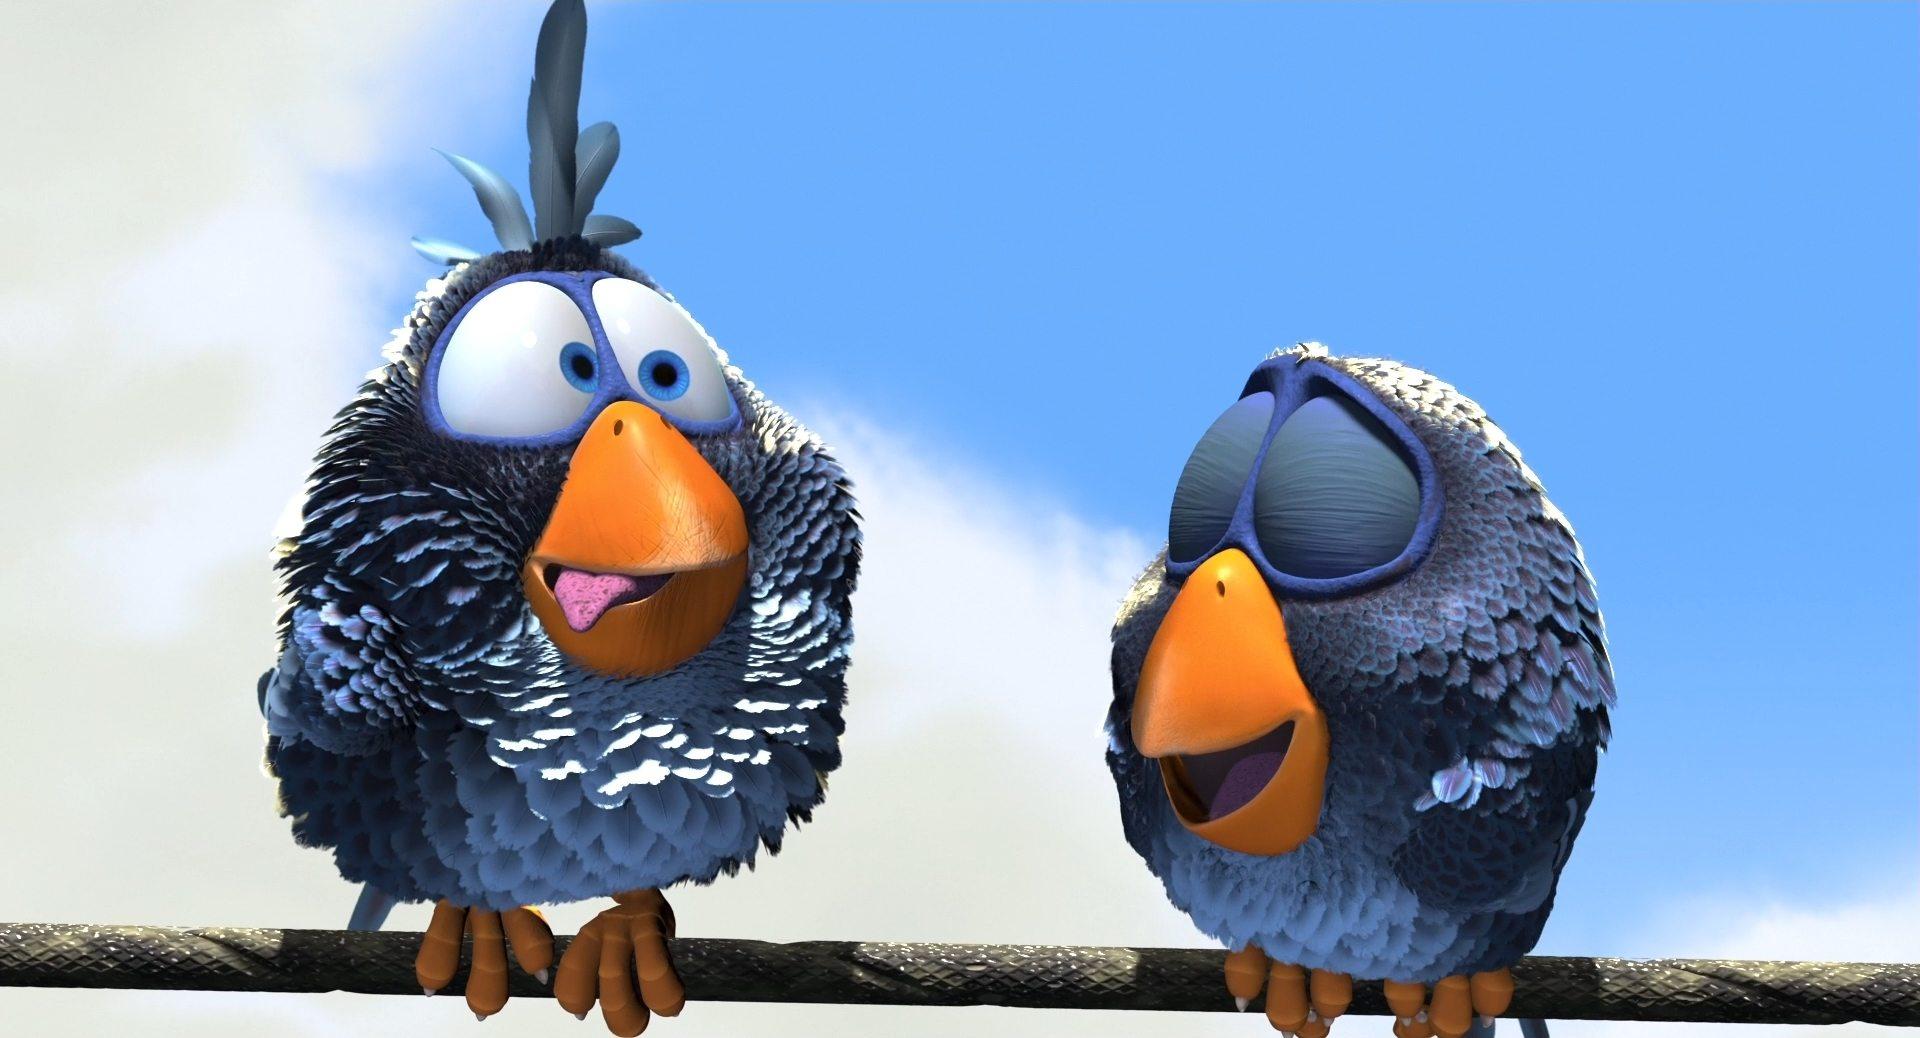 Bing: О птичках 2000